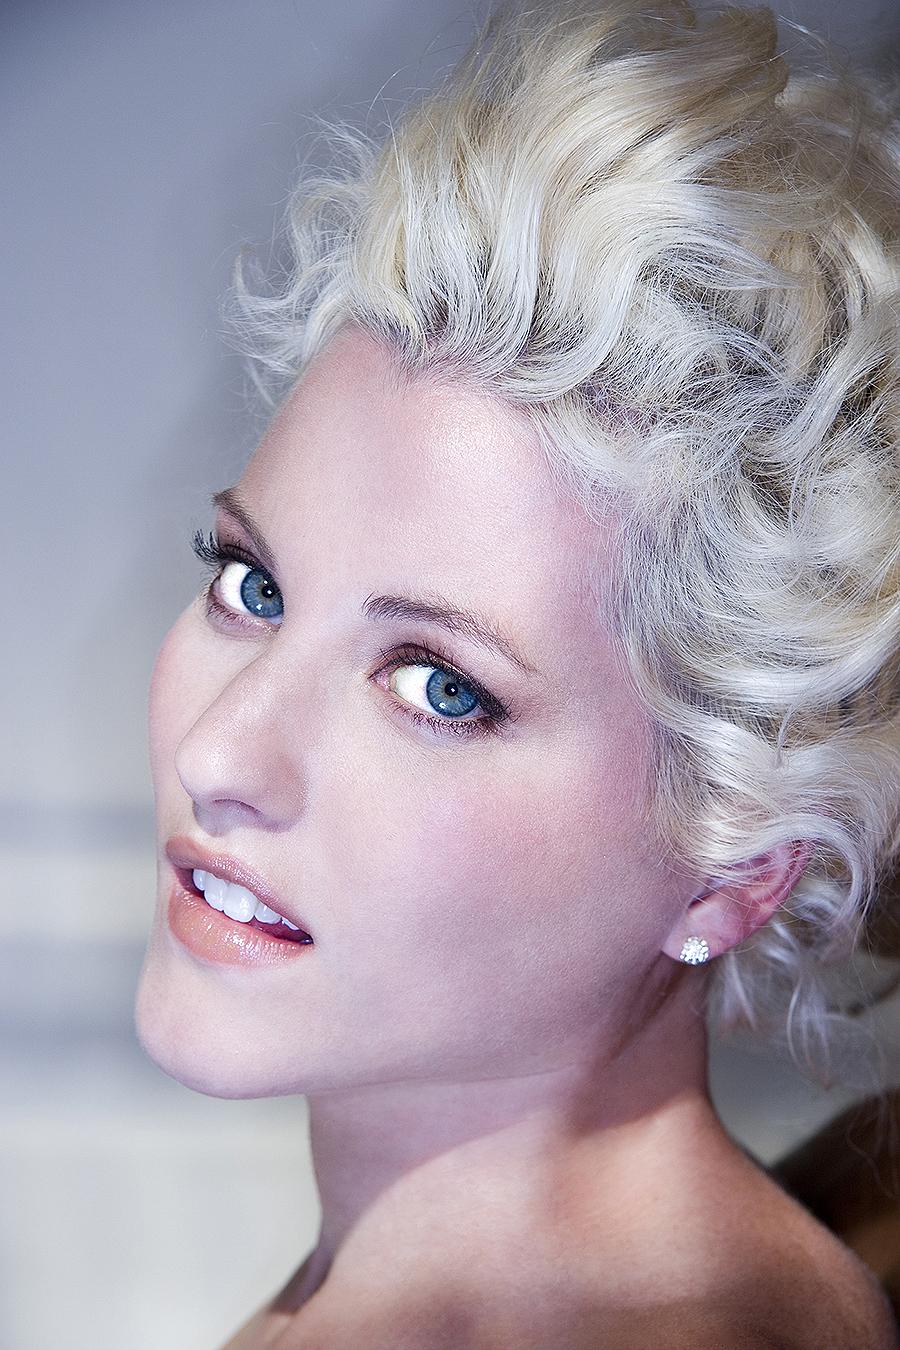 Tony_Ward_erotic_fashion_photography_blue_eyed_blonde_topless_beautiful_light